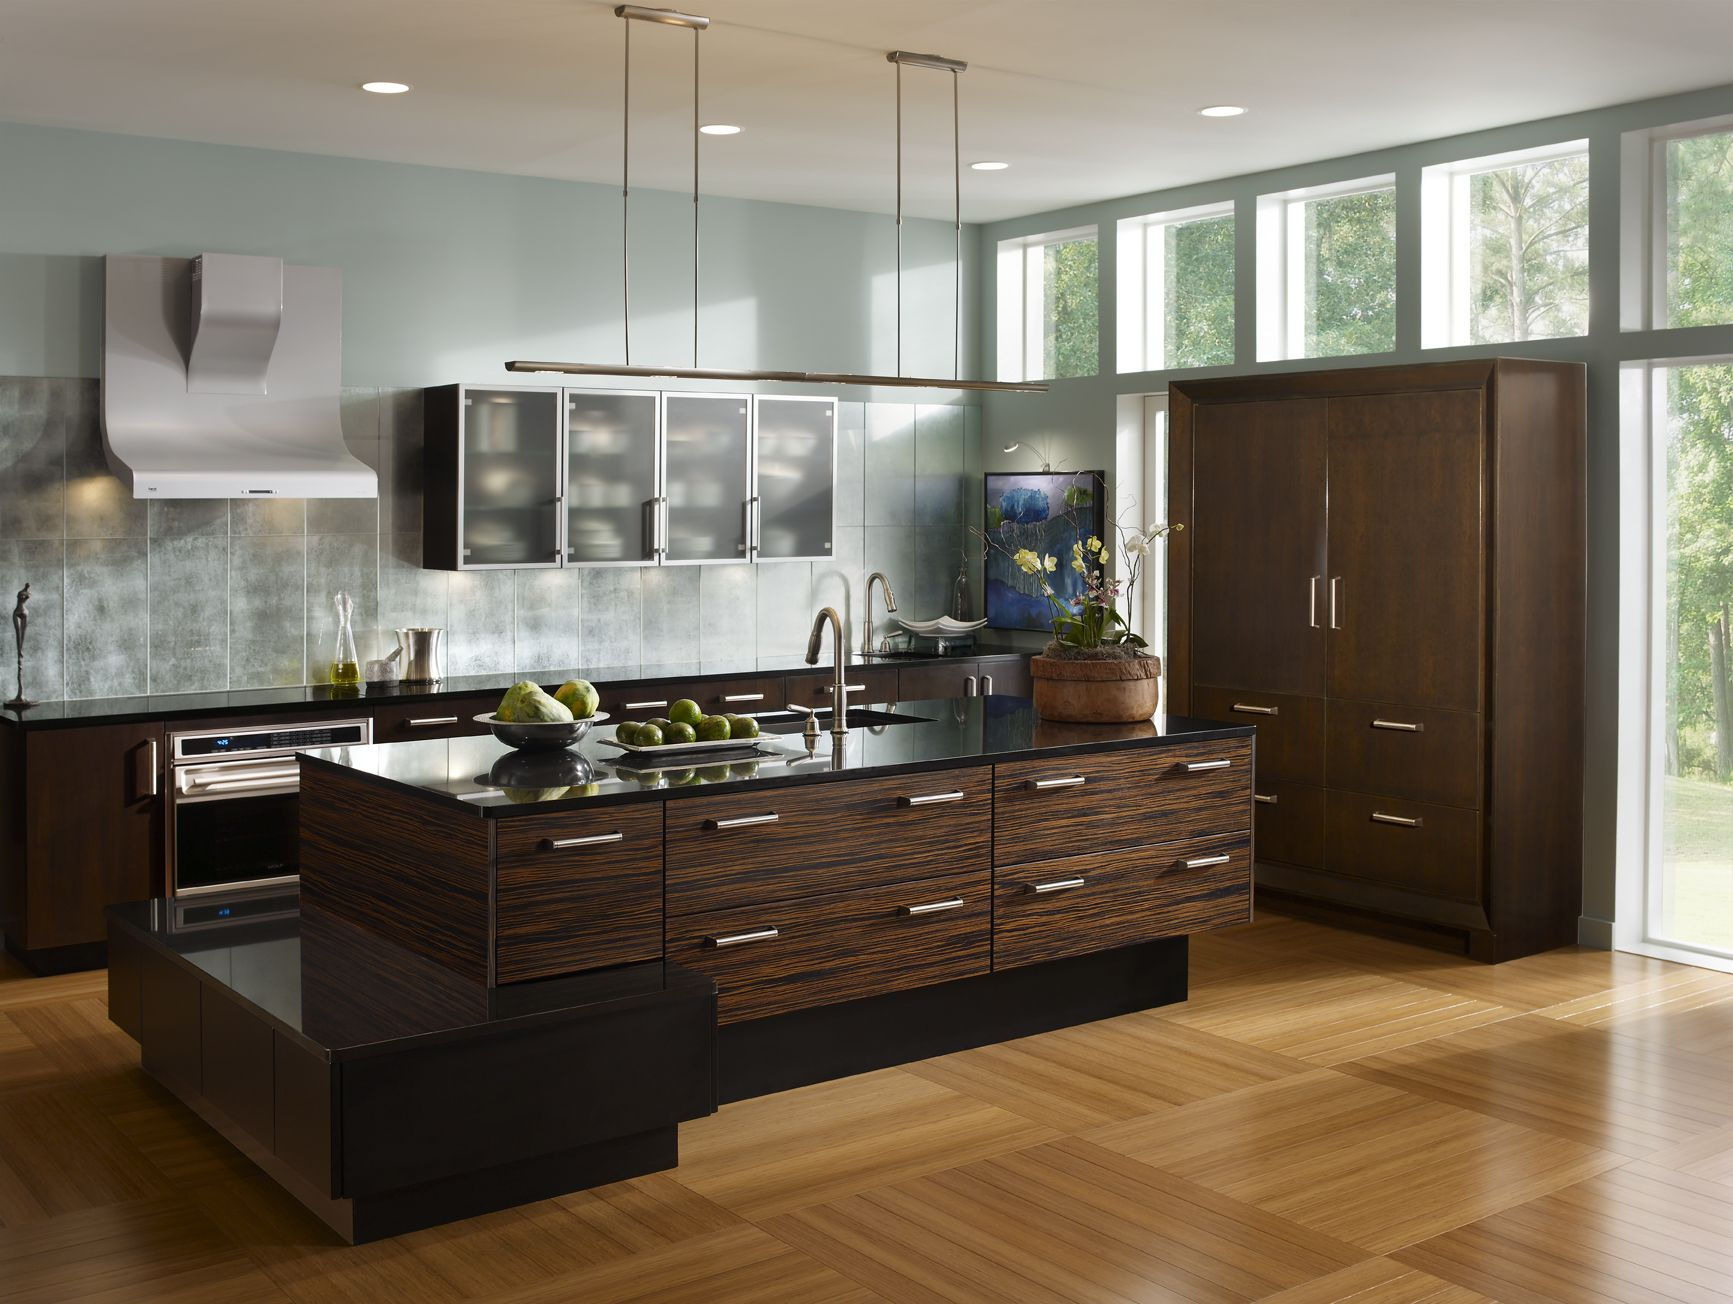 Custom Cabinet Designs Custom Kitchen Cabinets Designs Contemporary Kitchen Kitchen Cabinet Design Custom Kitchen Cabinets Design